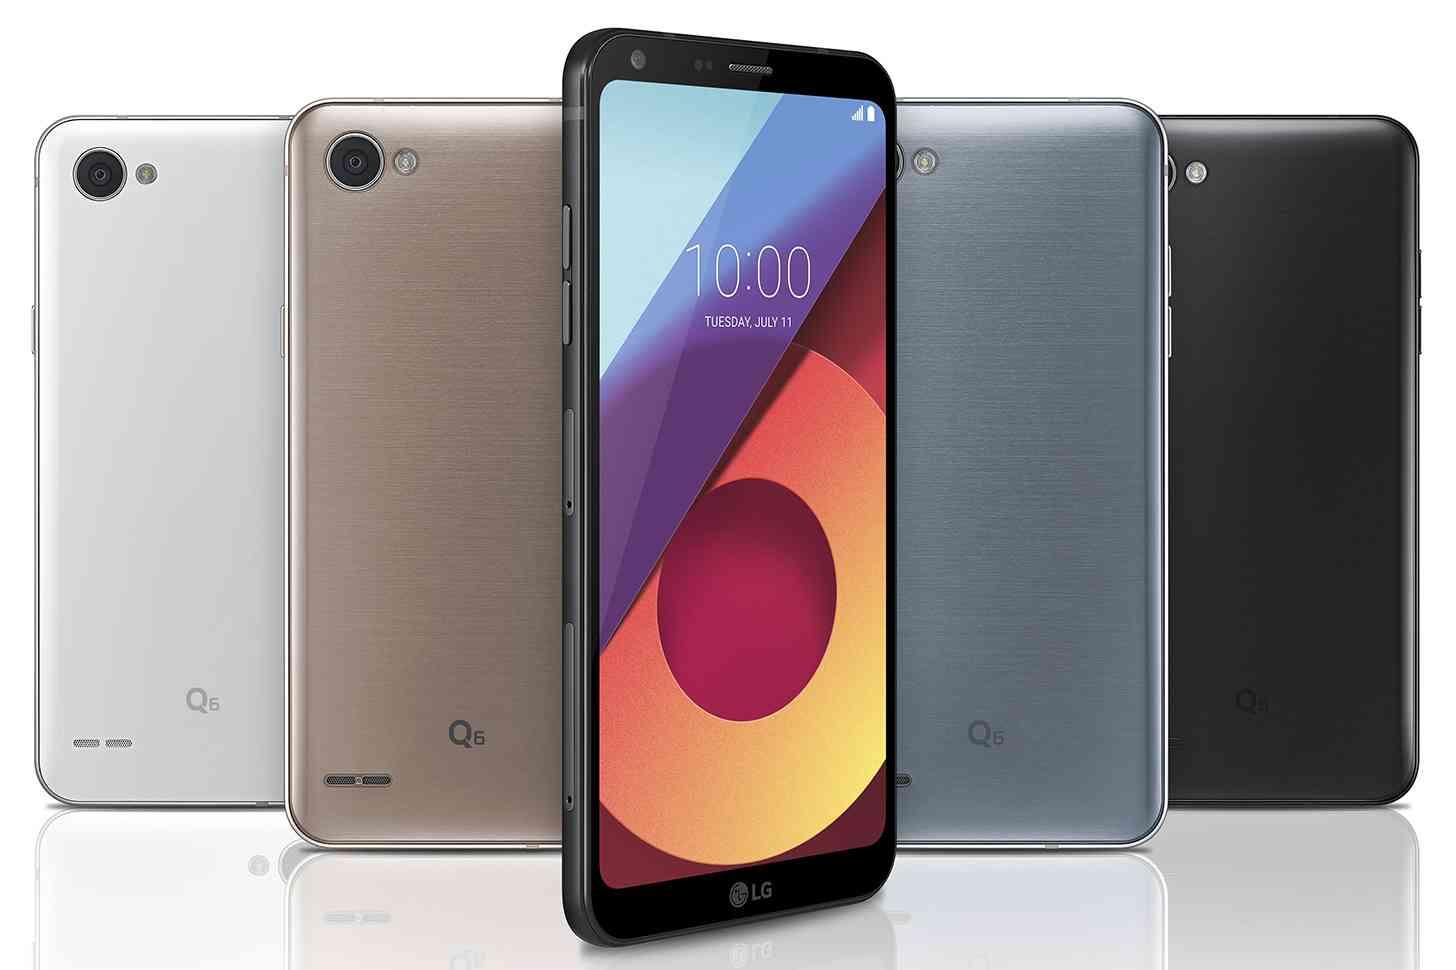 LG G6 Mini is launching July 11